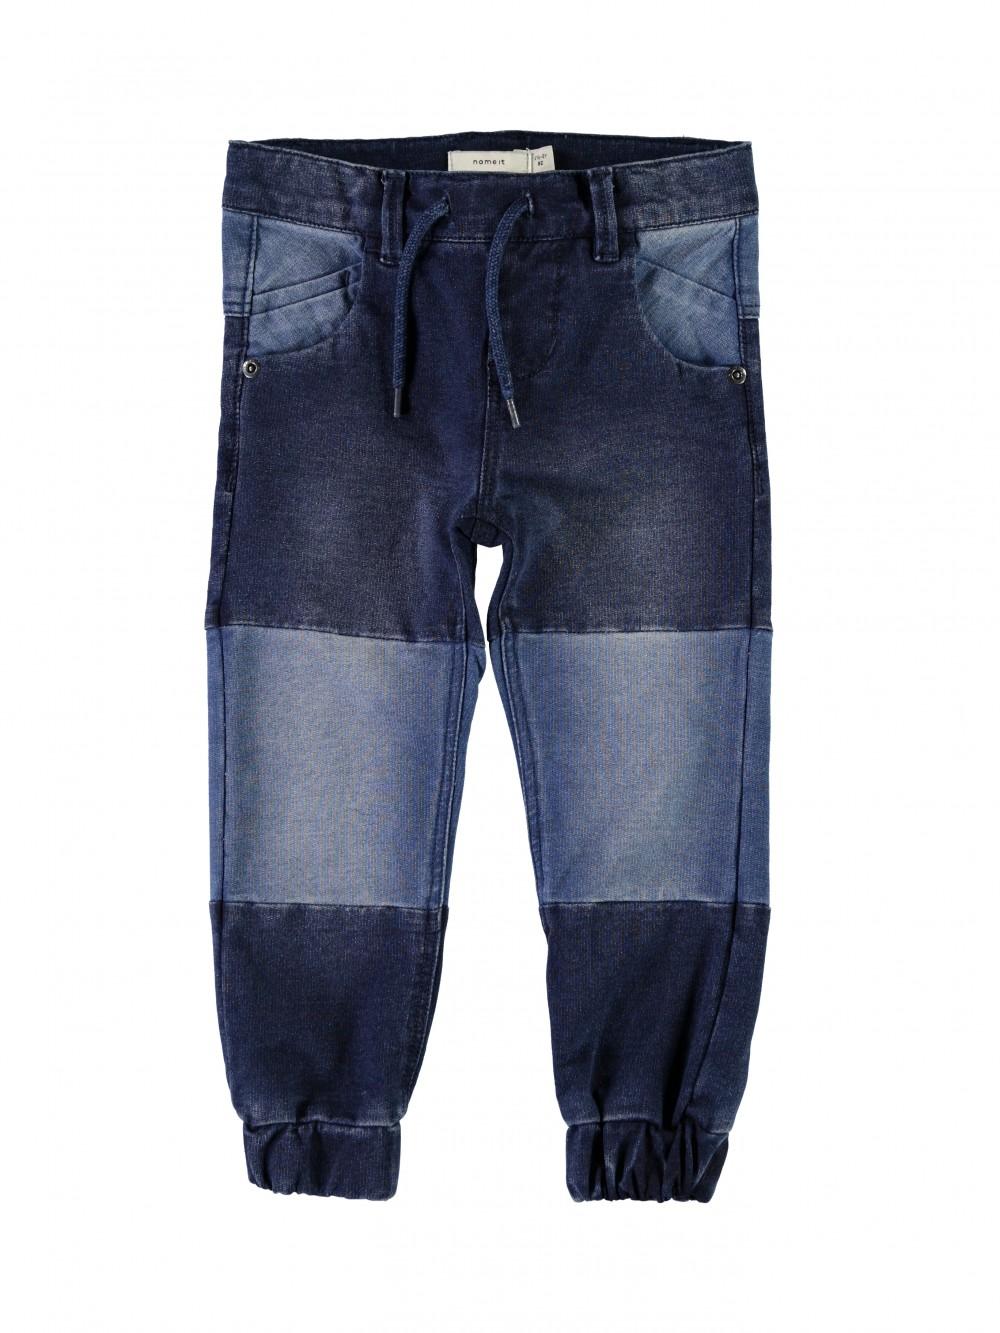 24bfb8f4 Name It Blå jeans i sweat-kvalitet – Mio Trend